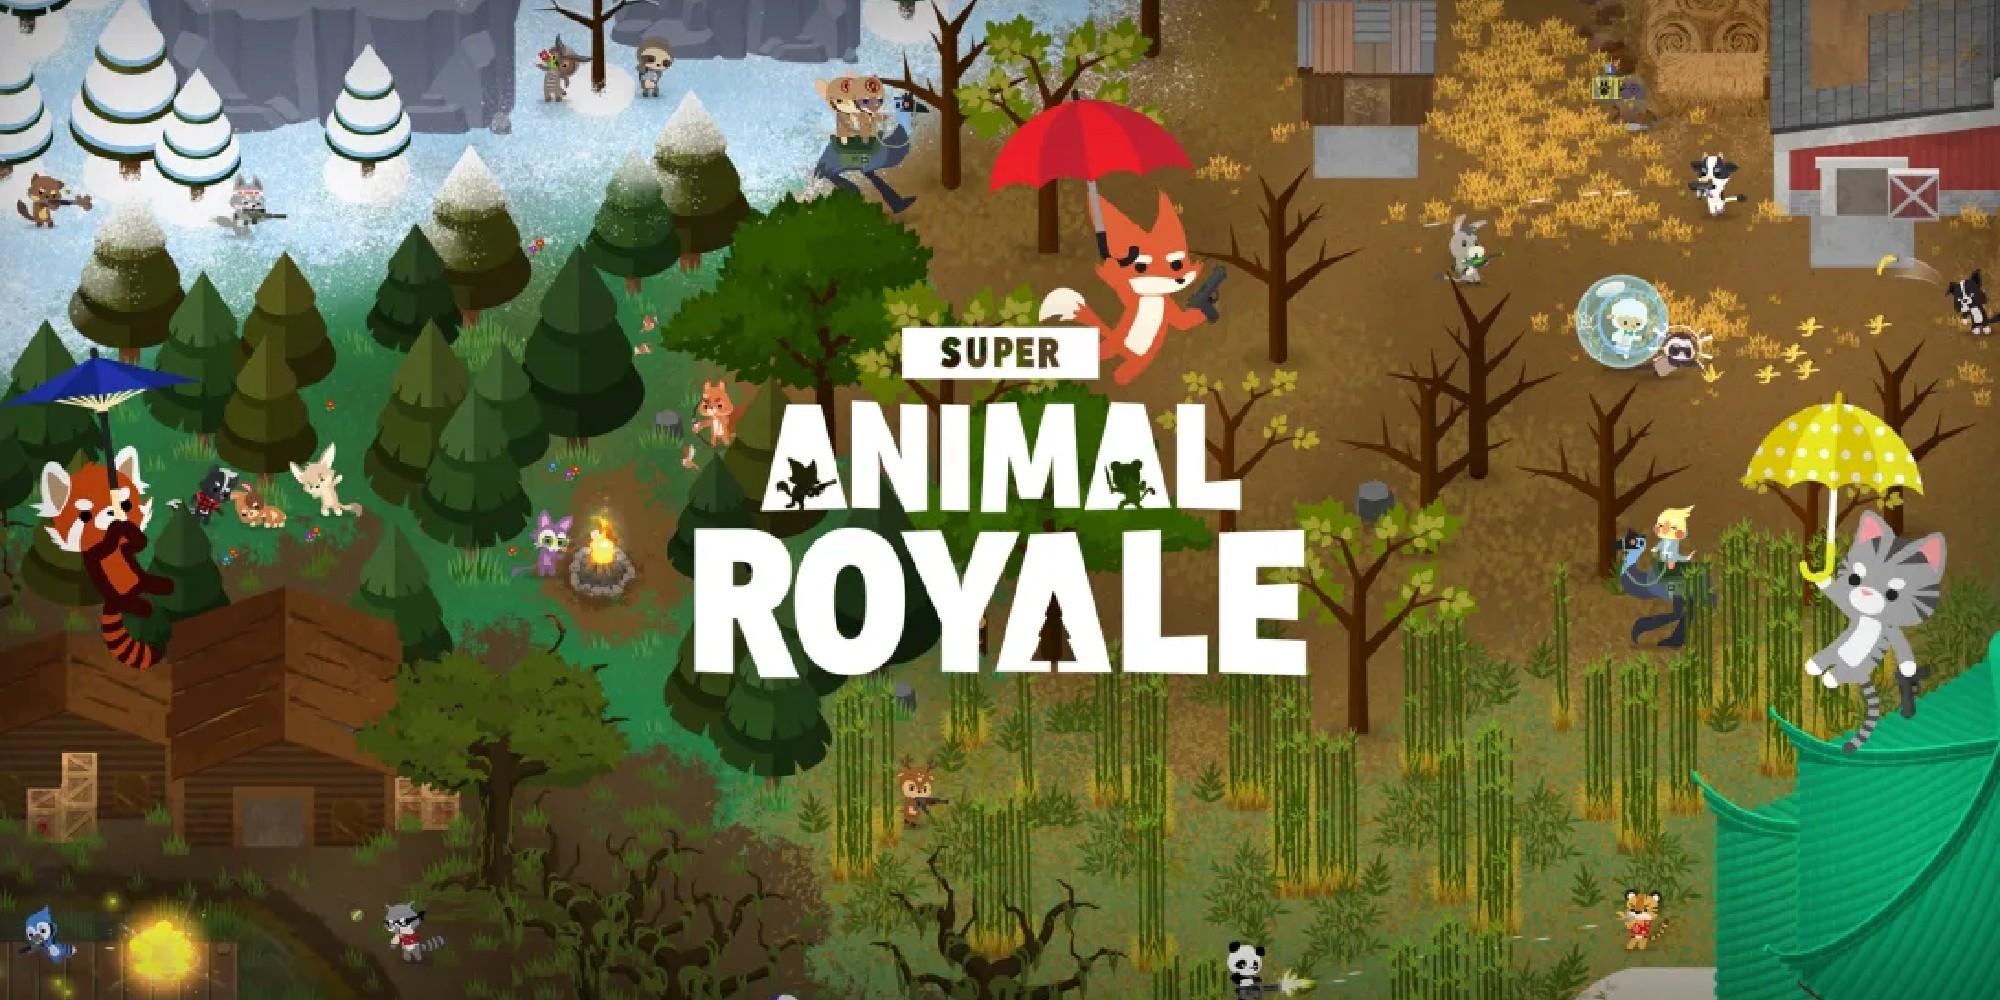 Super Animal Royal Review